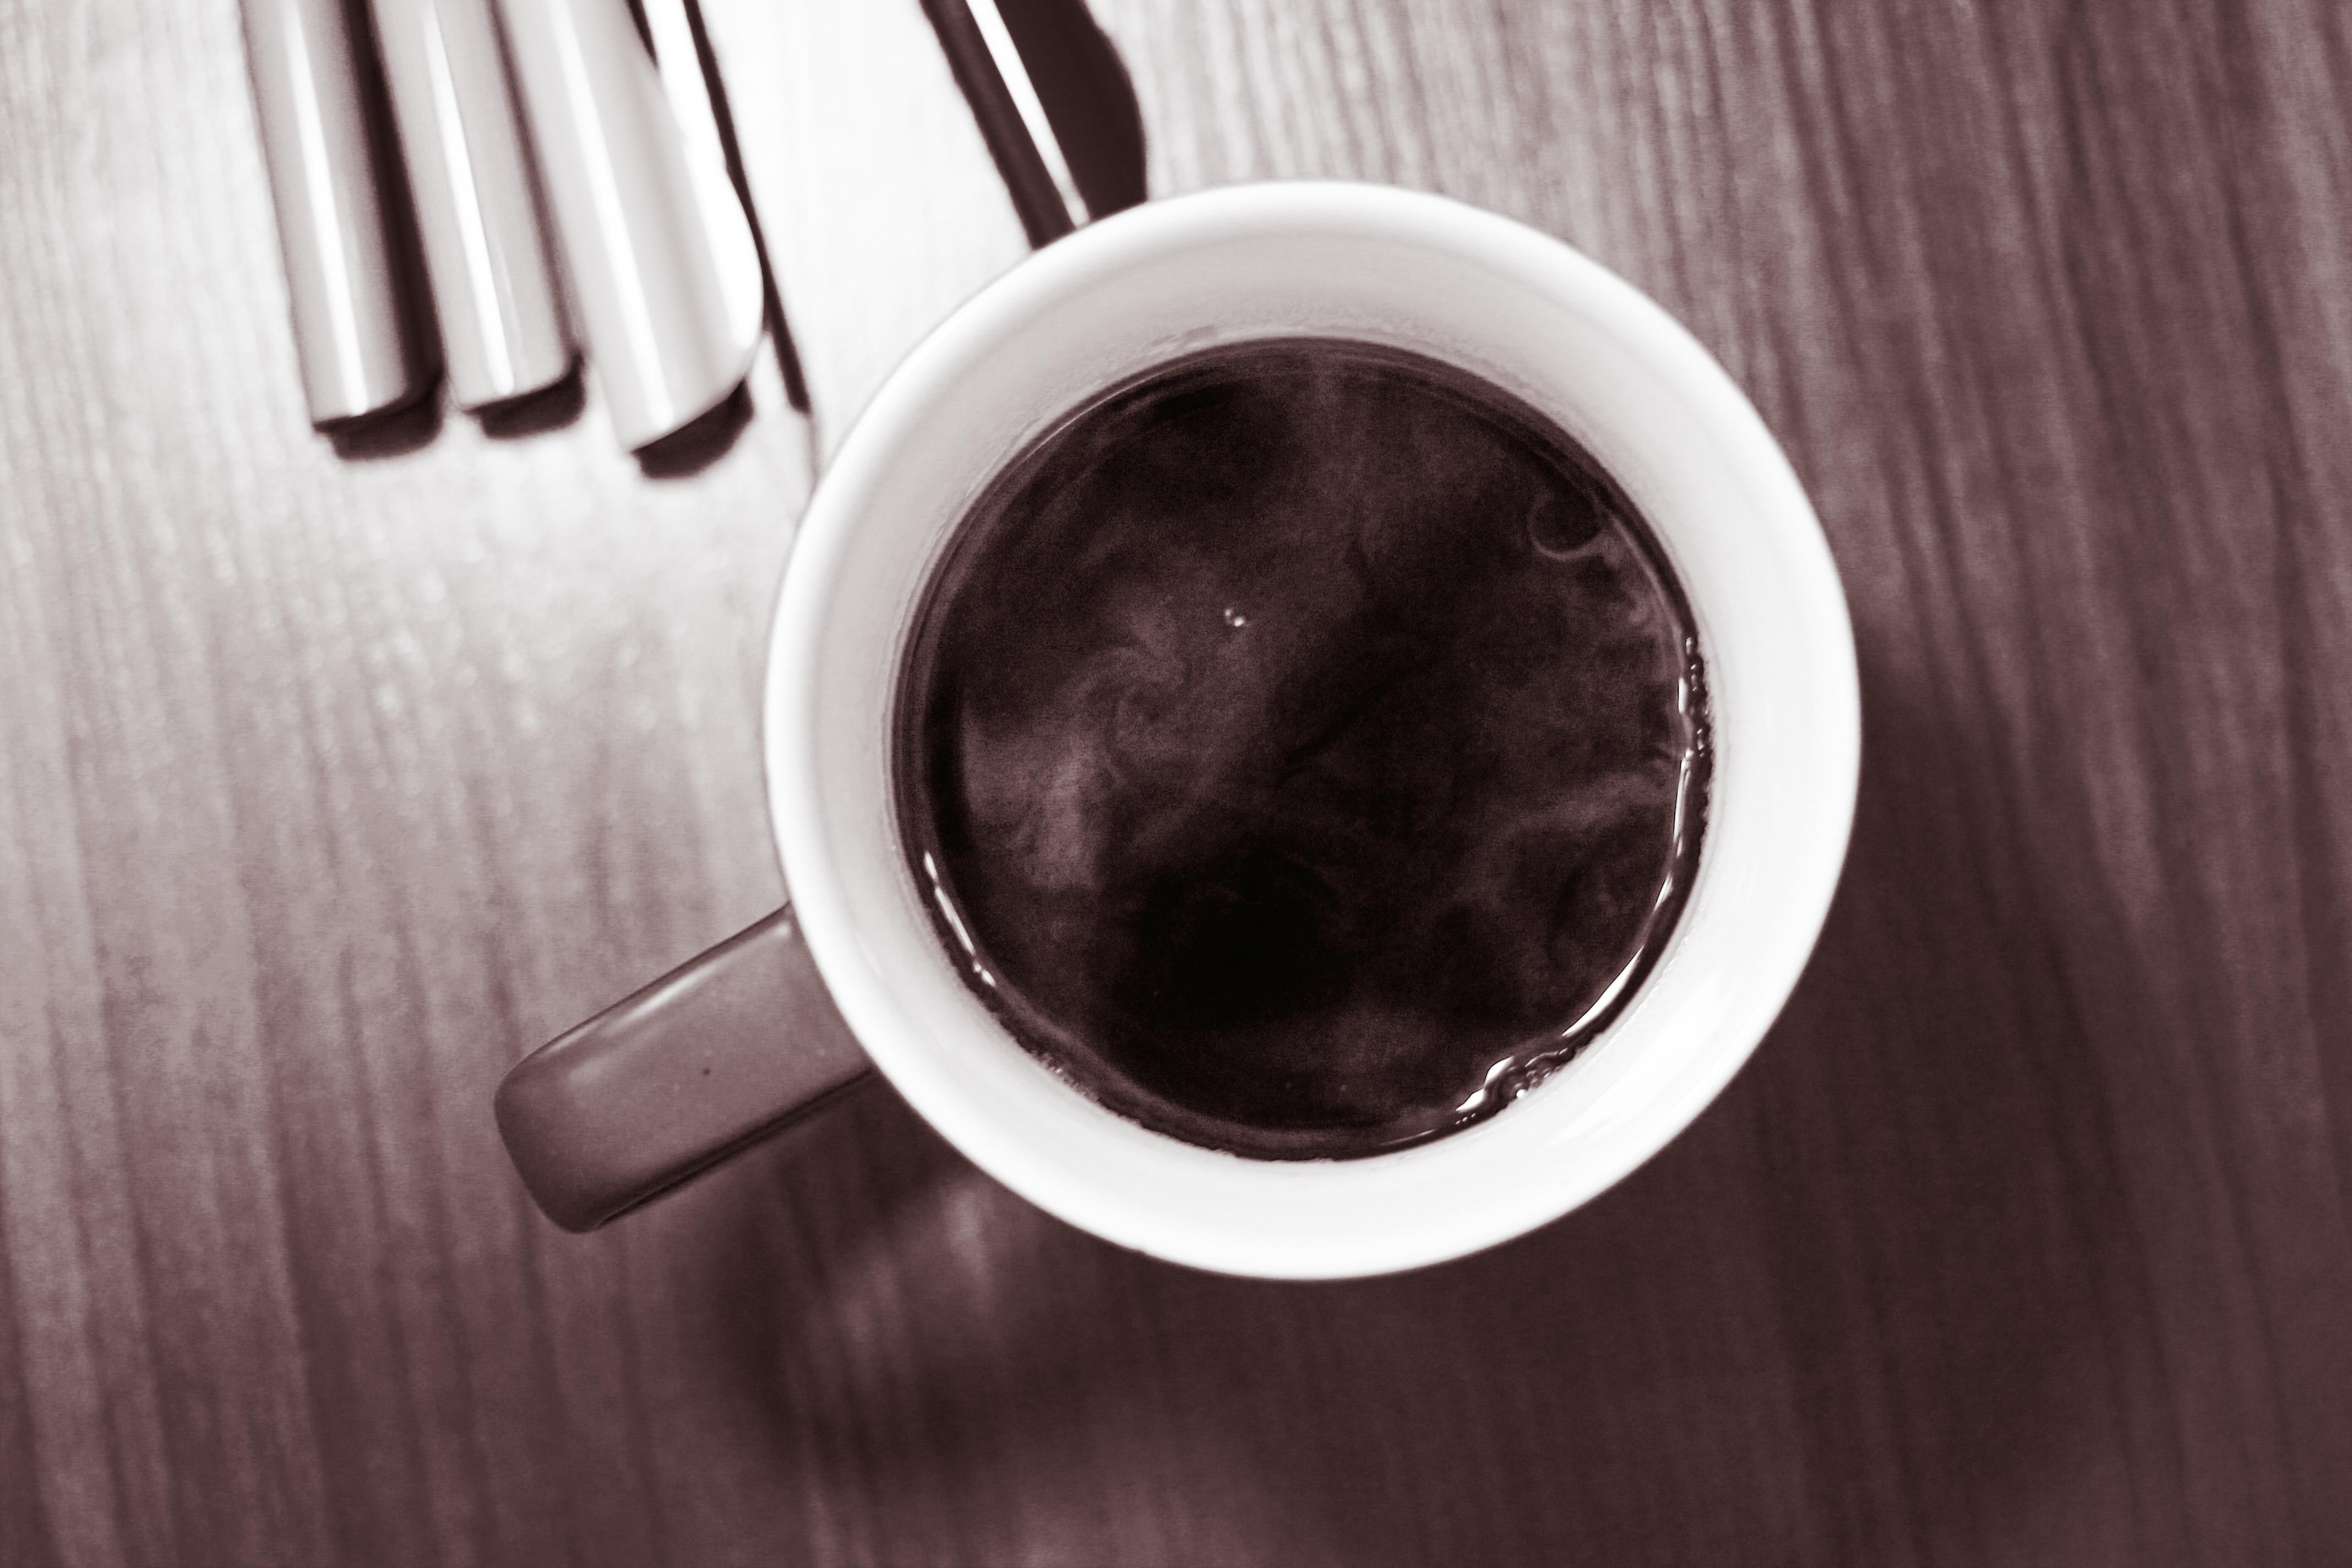 Coffee, Black, Blackcoffee, Coffee photos, Drink, HQ Photo